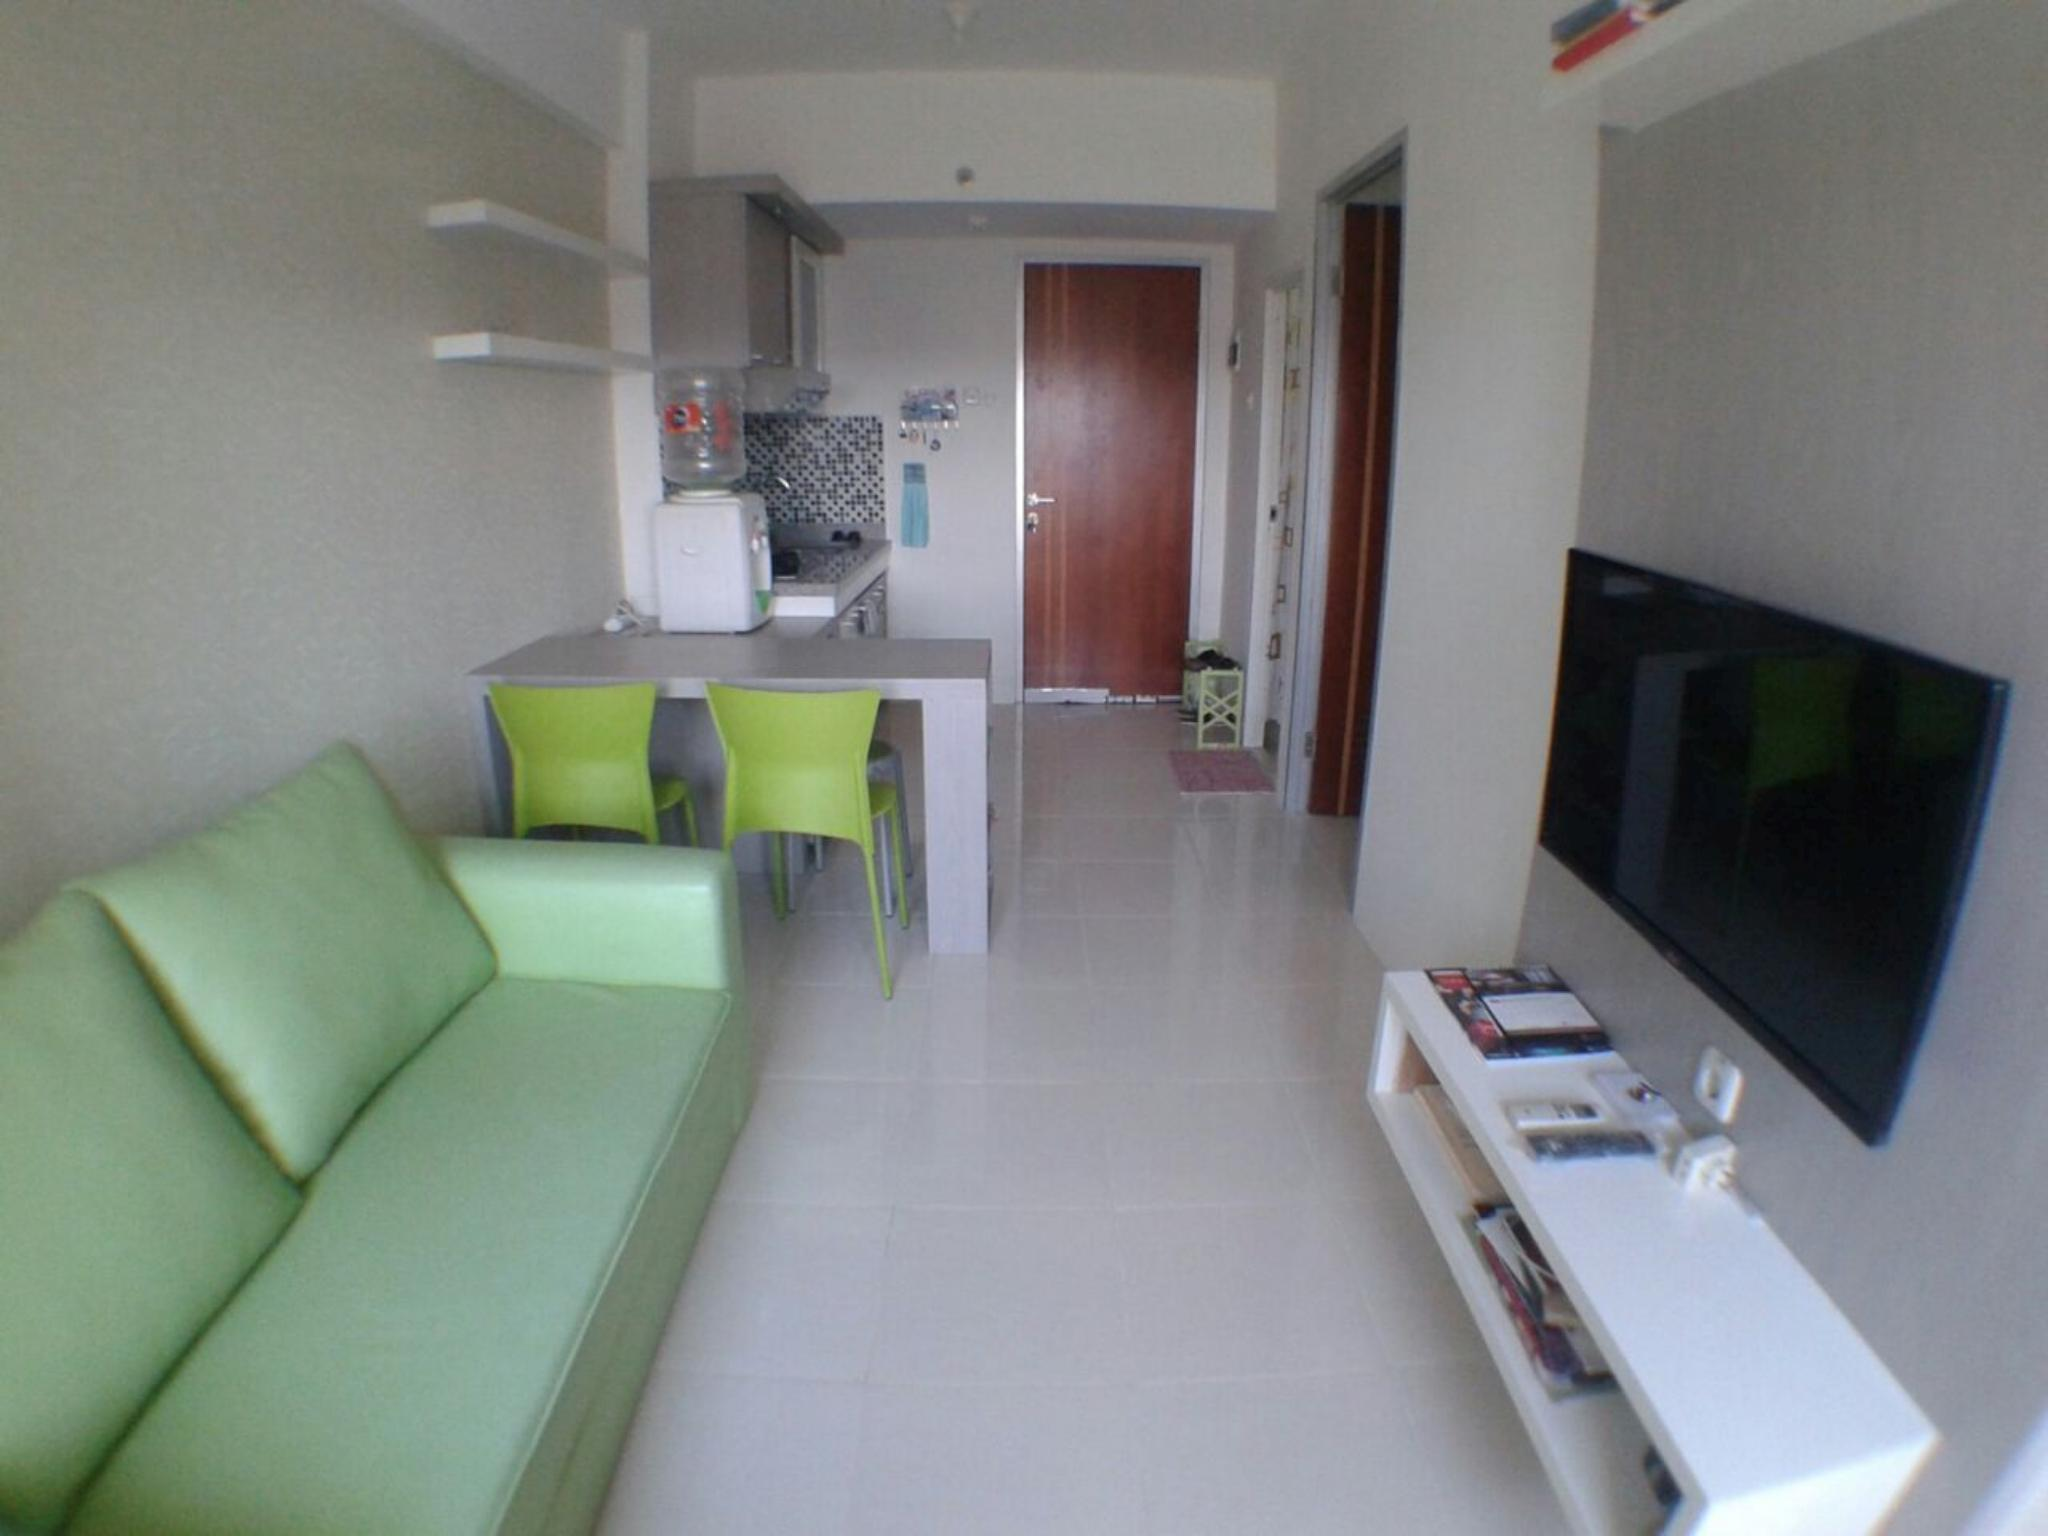 2 Bedroom 2 Puncak Kertajaya Apartment Rava Home